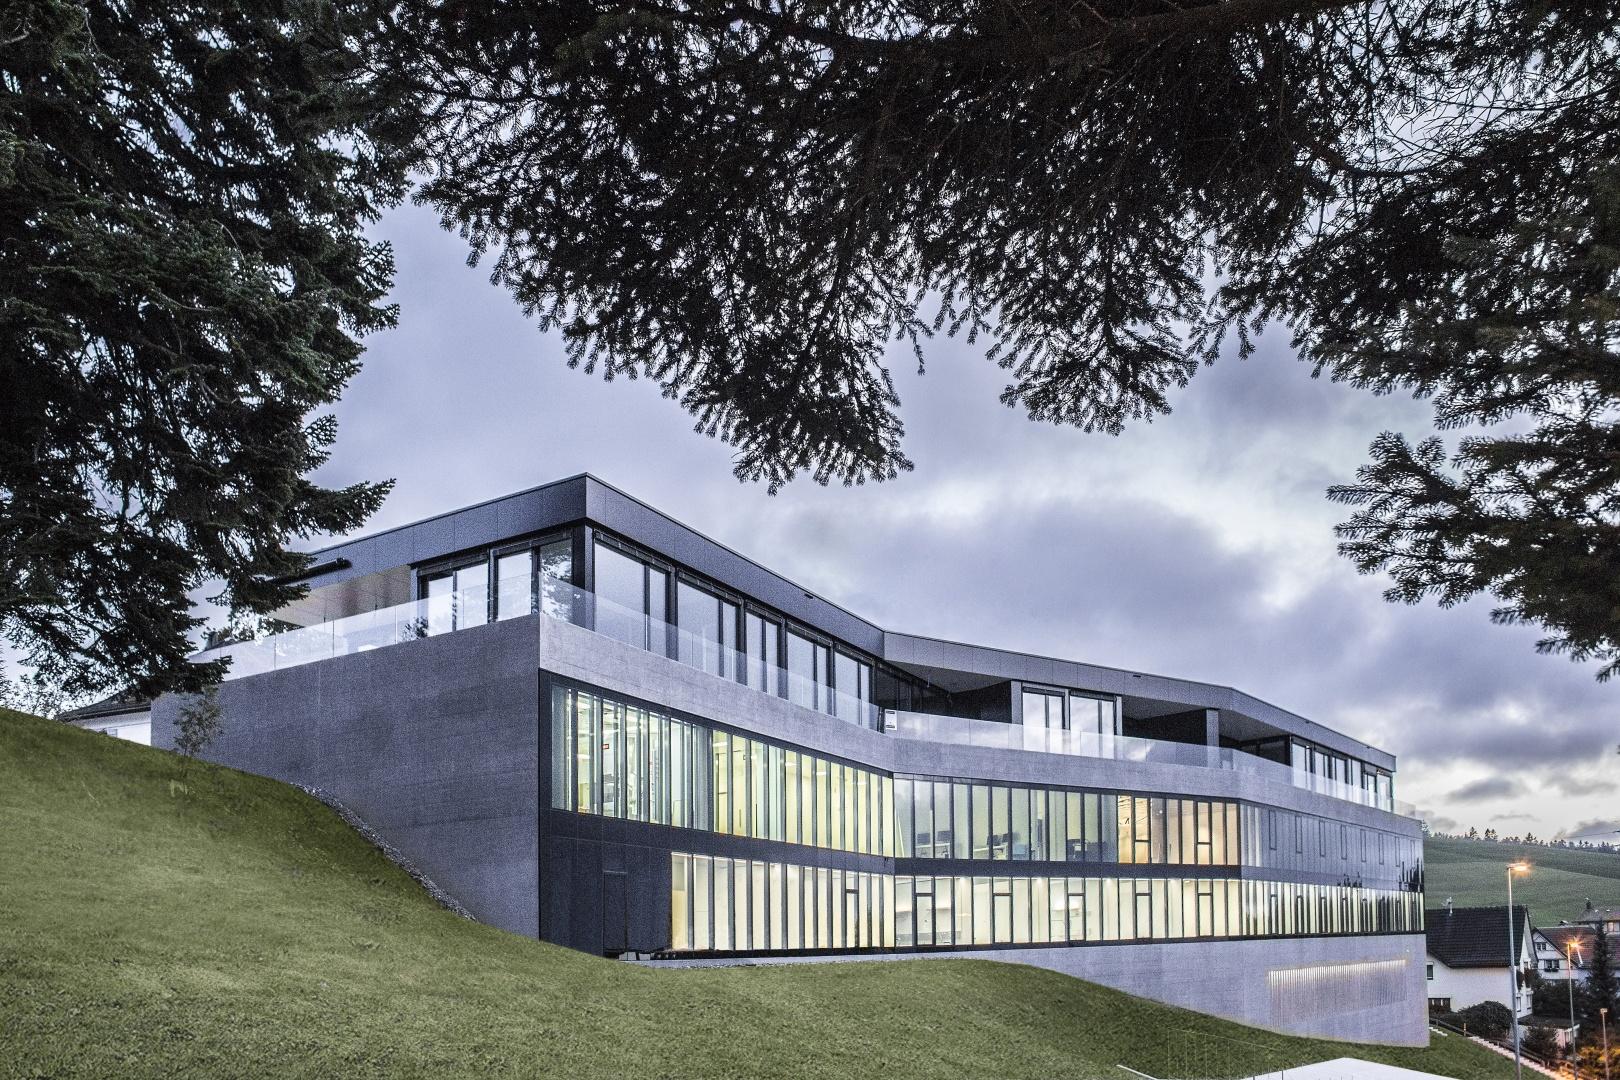 Klinik Bellavista Speicher © Petra Rainer